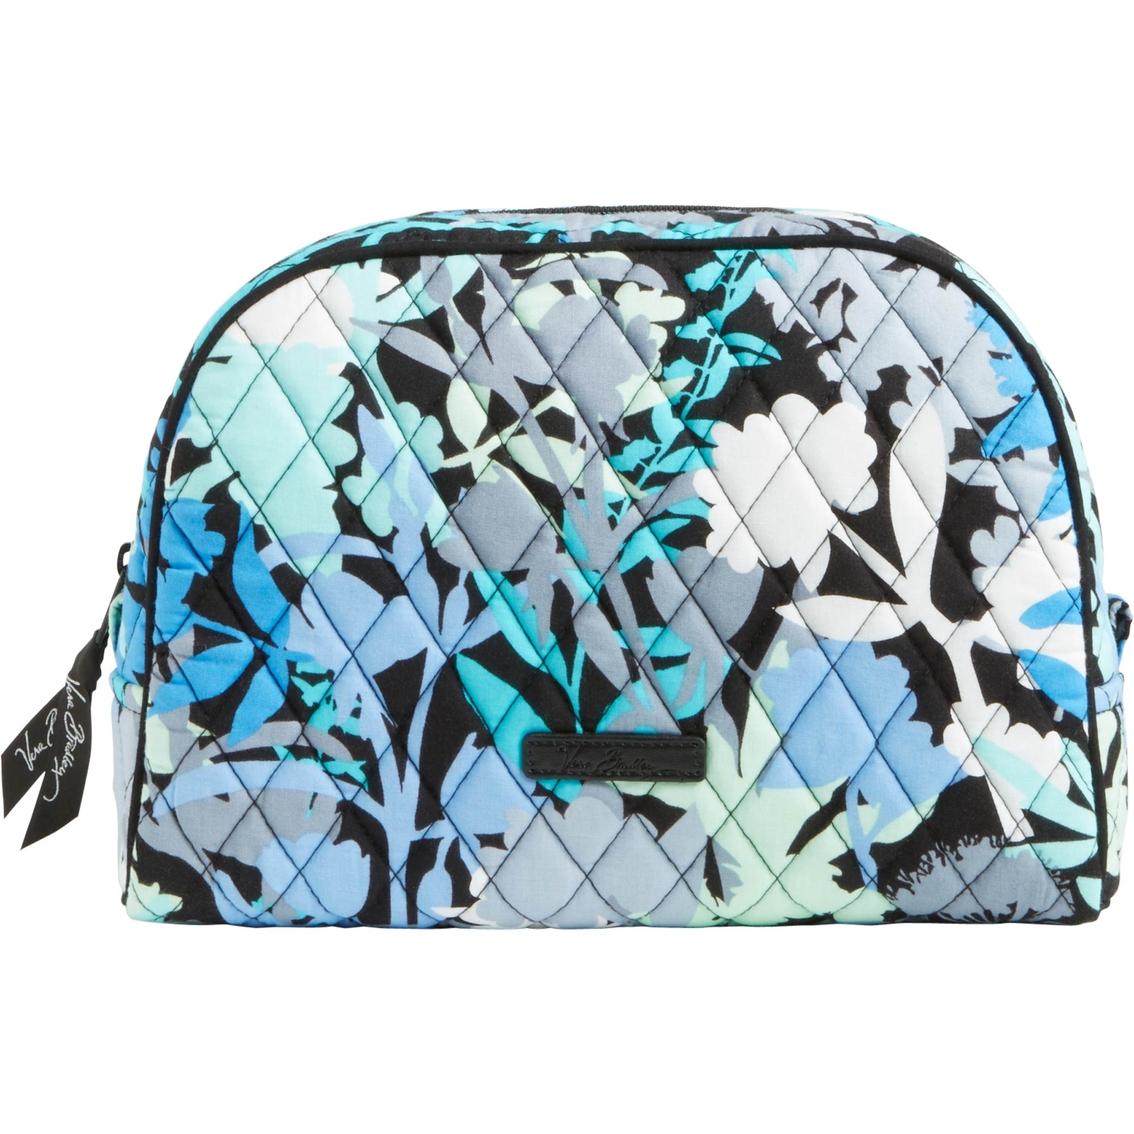 Vera Bradley Large Zip Cosmetics Bag, Camofloral